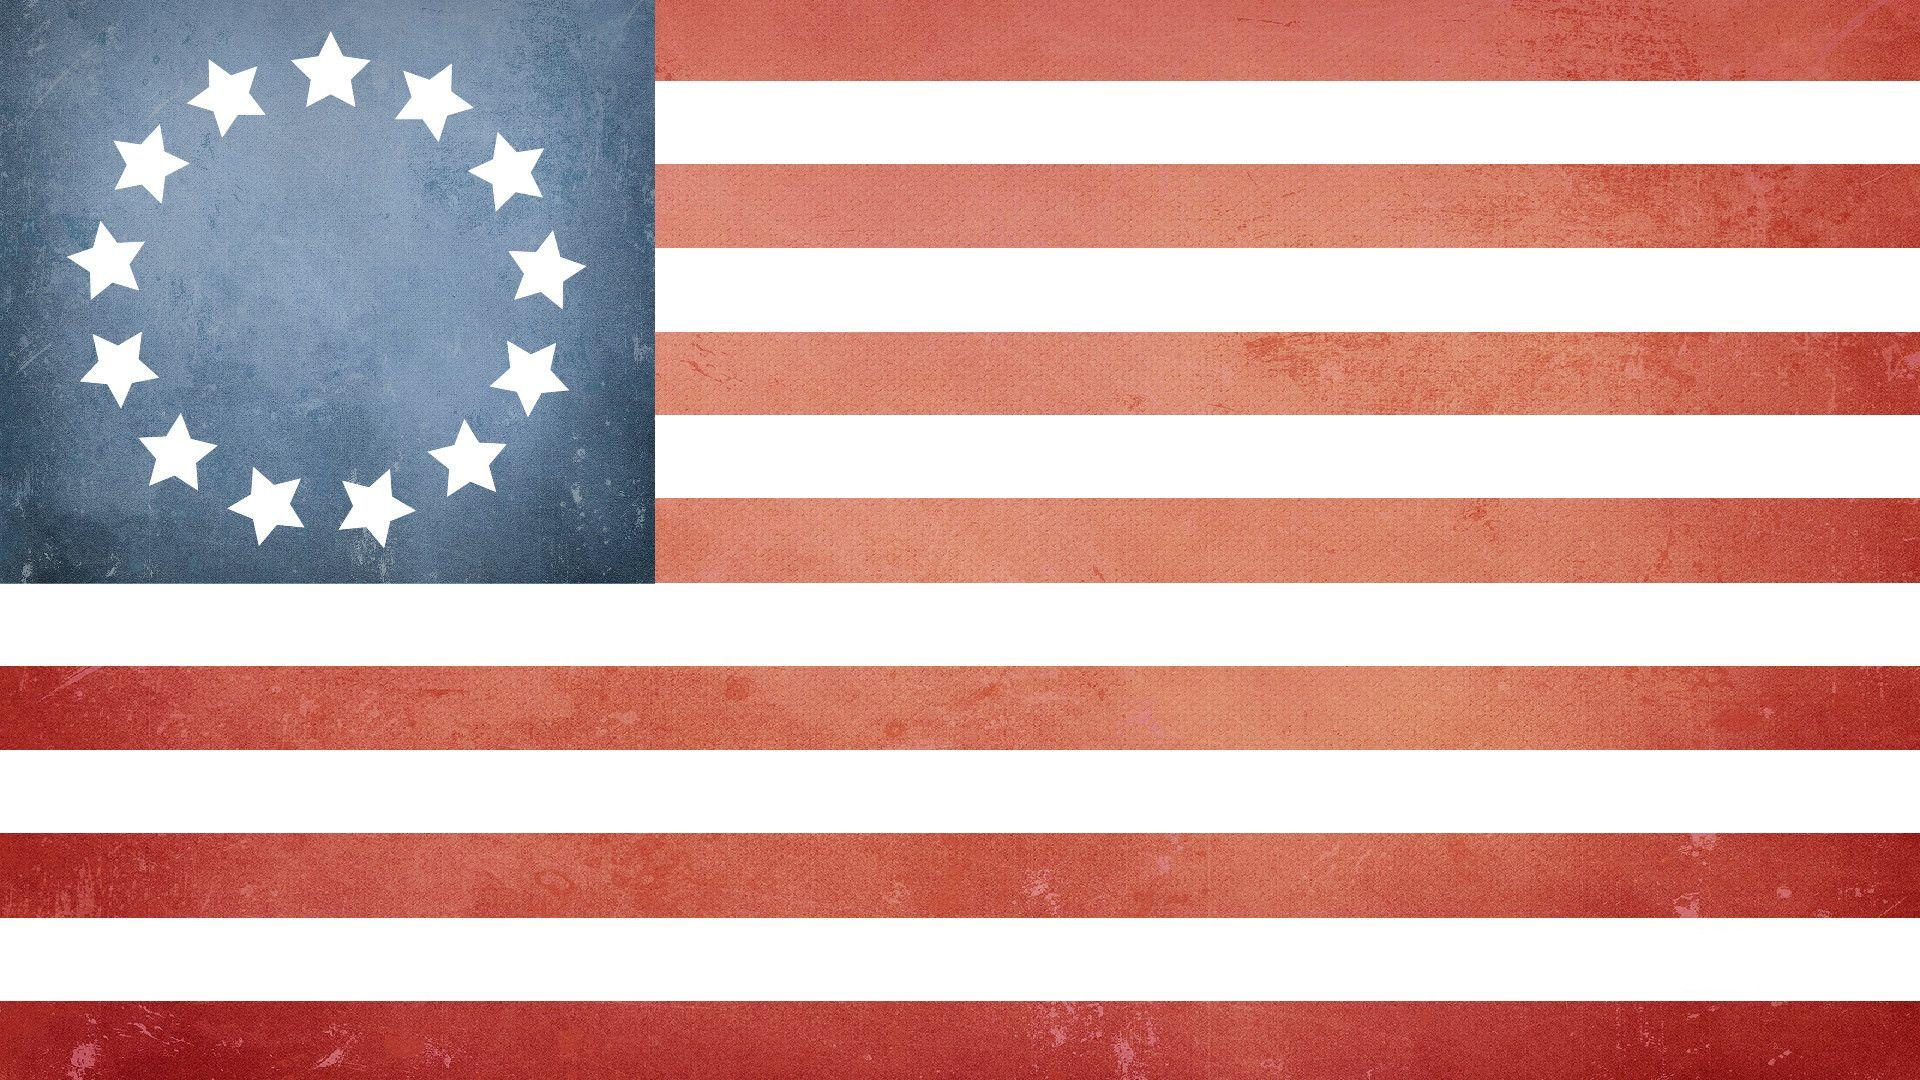 Hd wallpaper usa flag - 13 Star Us Flag Wallpapers Hd Wallpapers